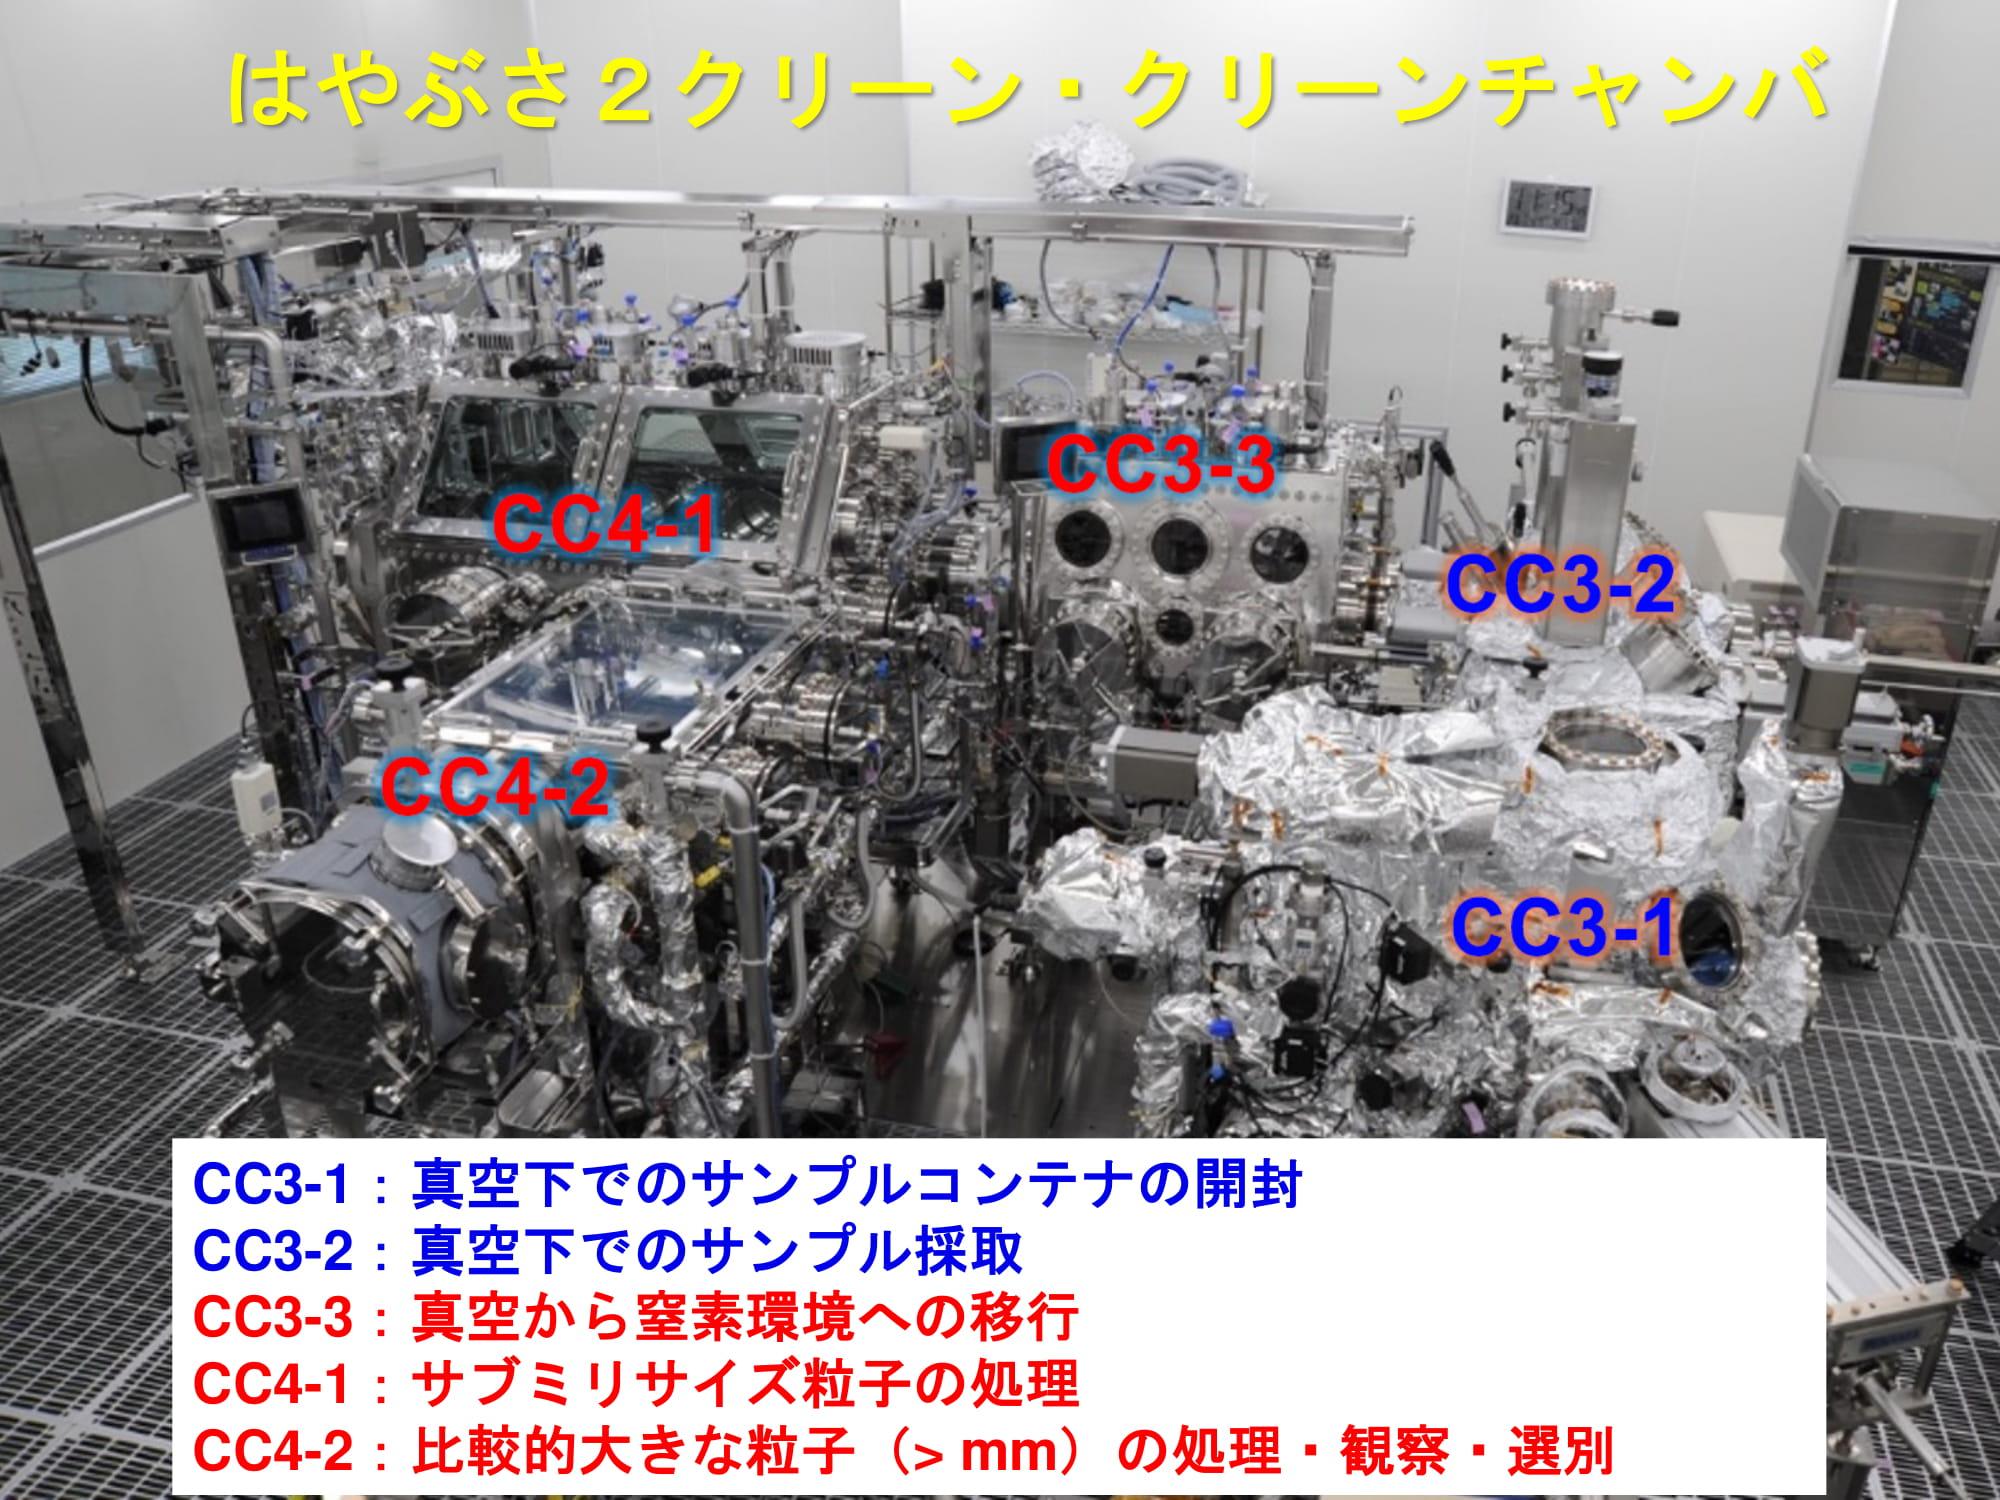 f:id:Imamura:20201208123030j:plain